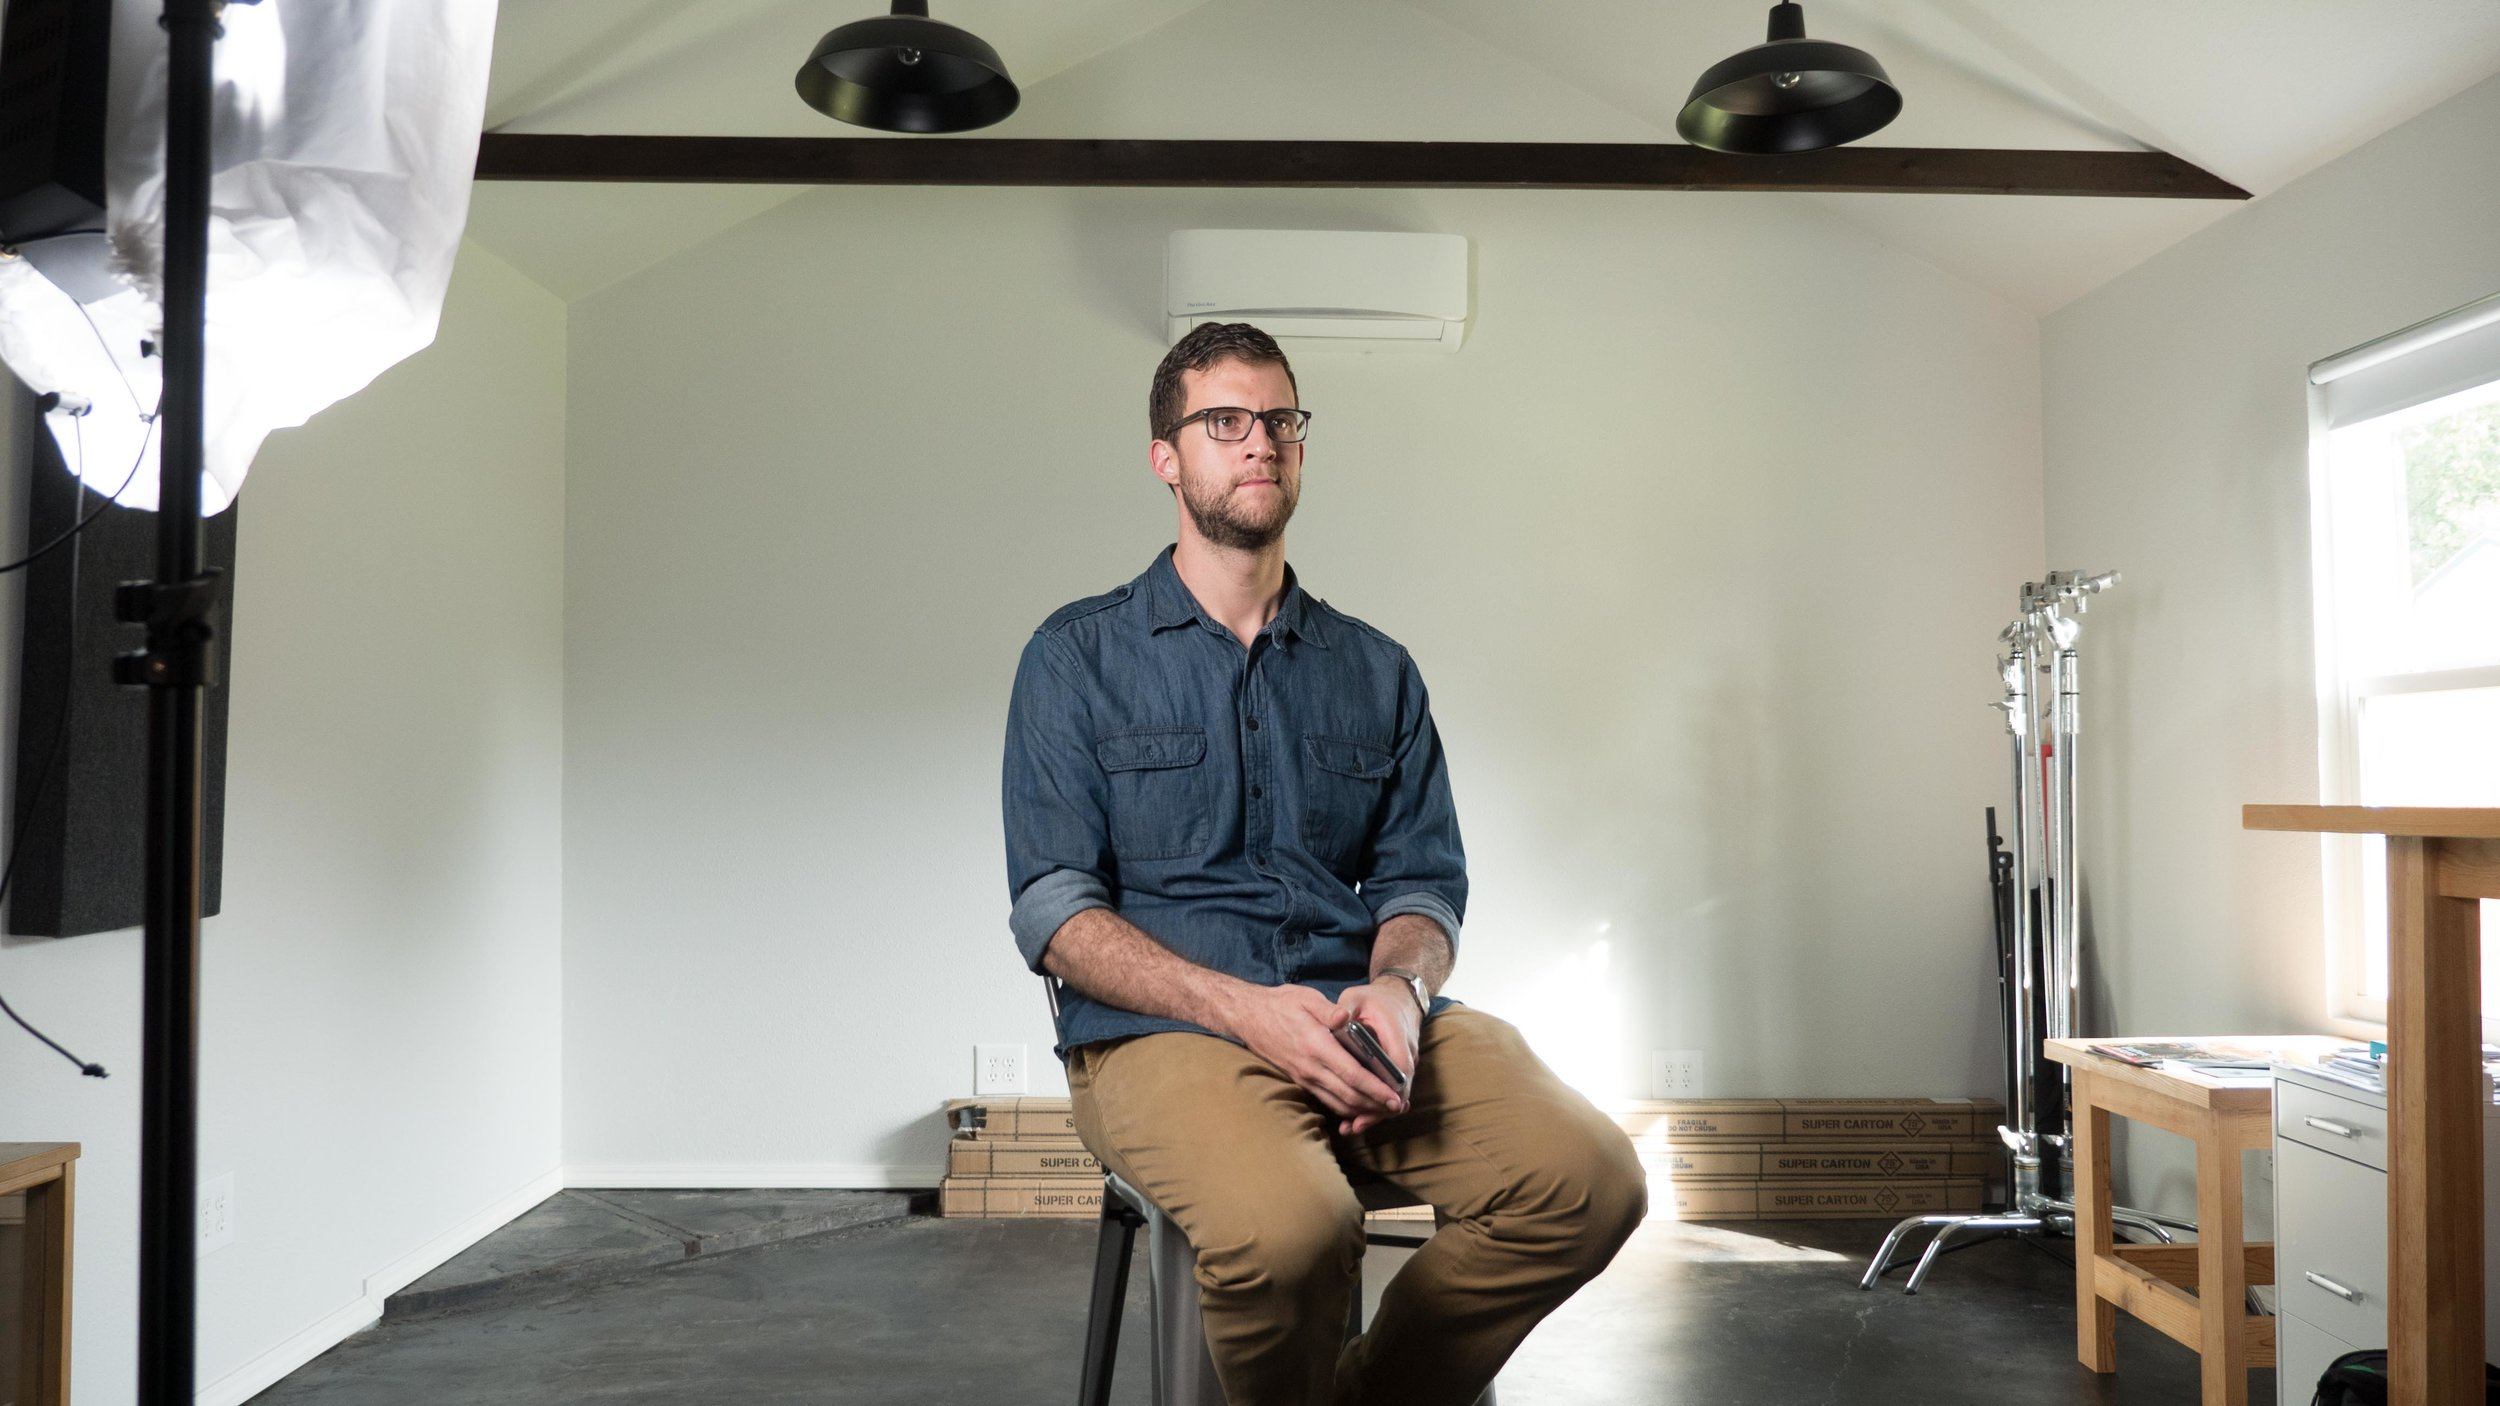 interview-lighting-guide-2-00008.jpg